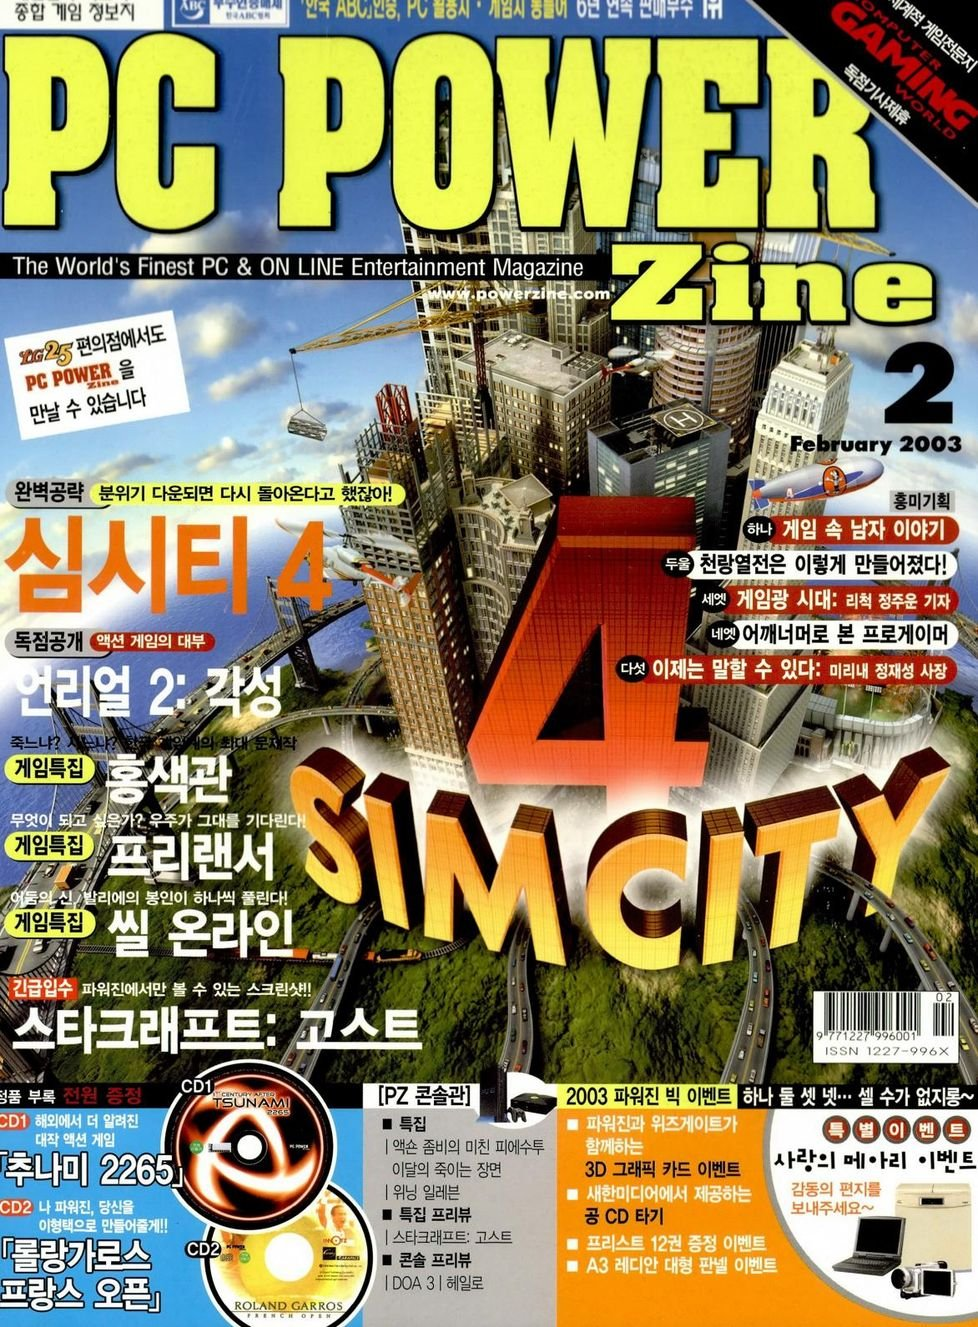 PC Power Zine Issue 091 (February 2003)